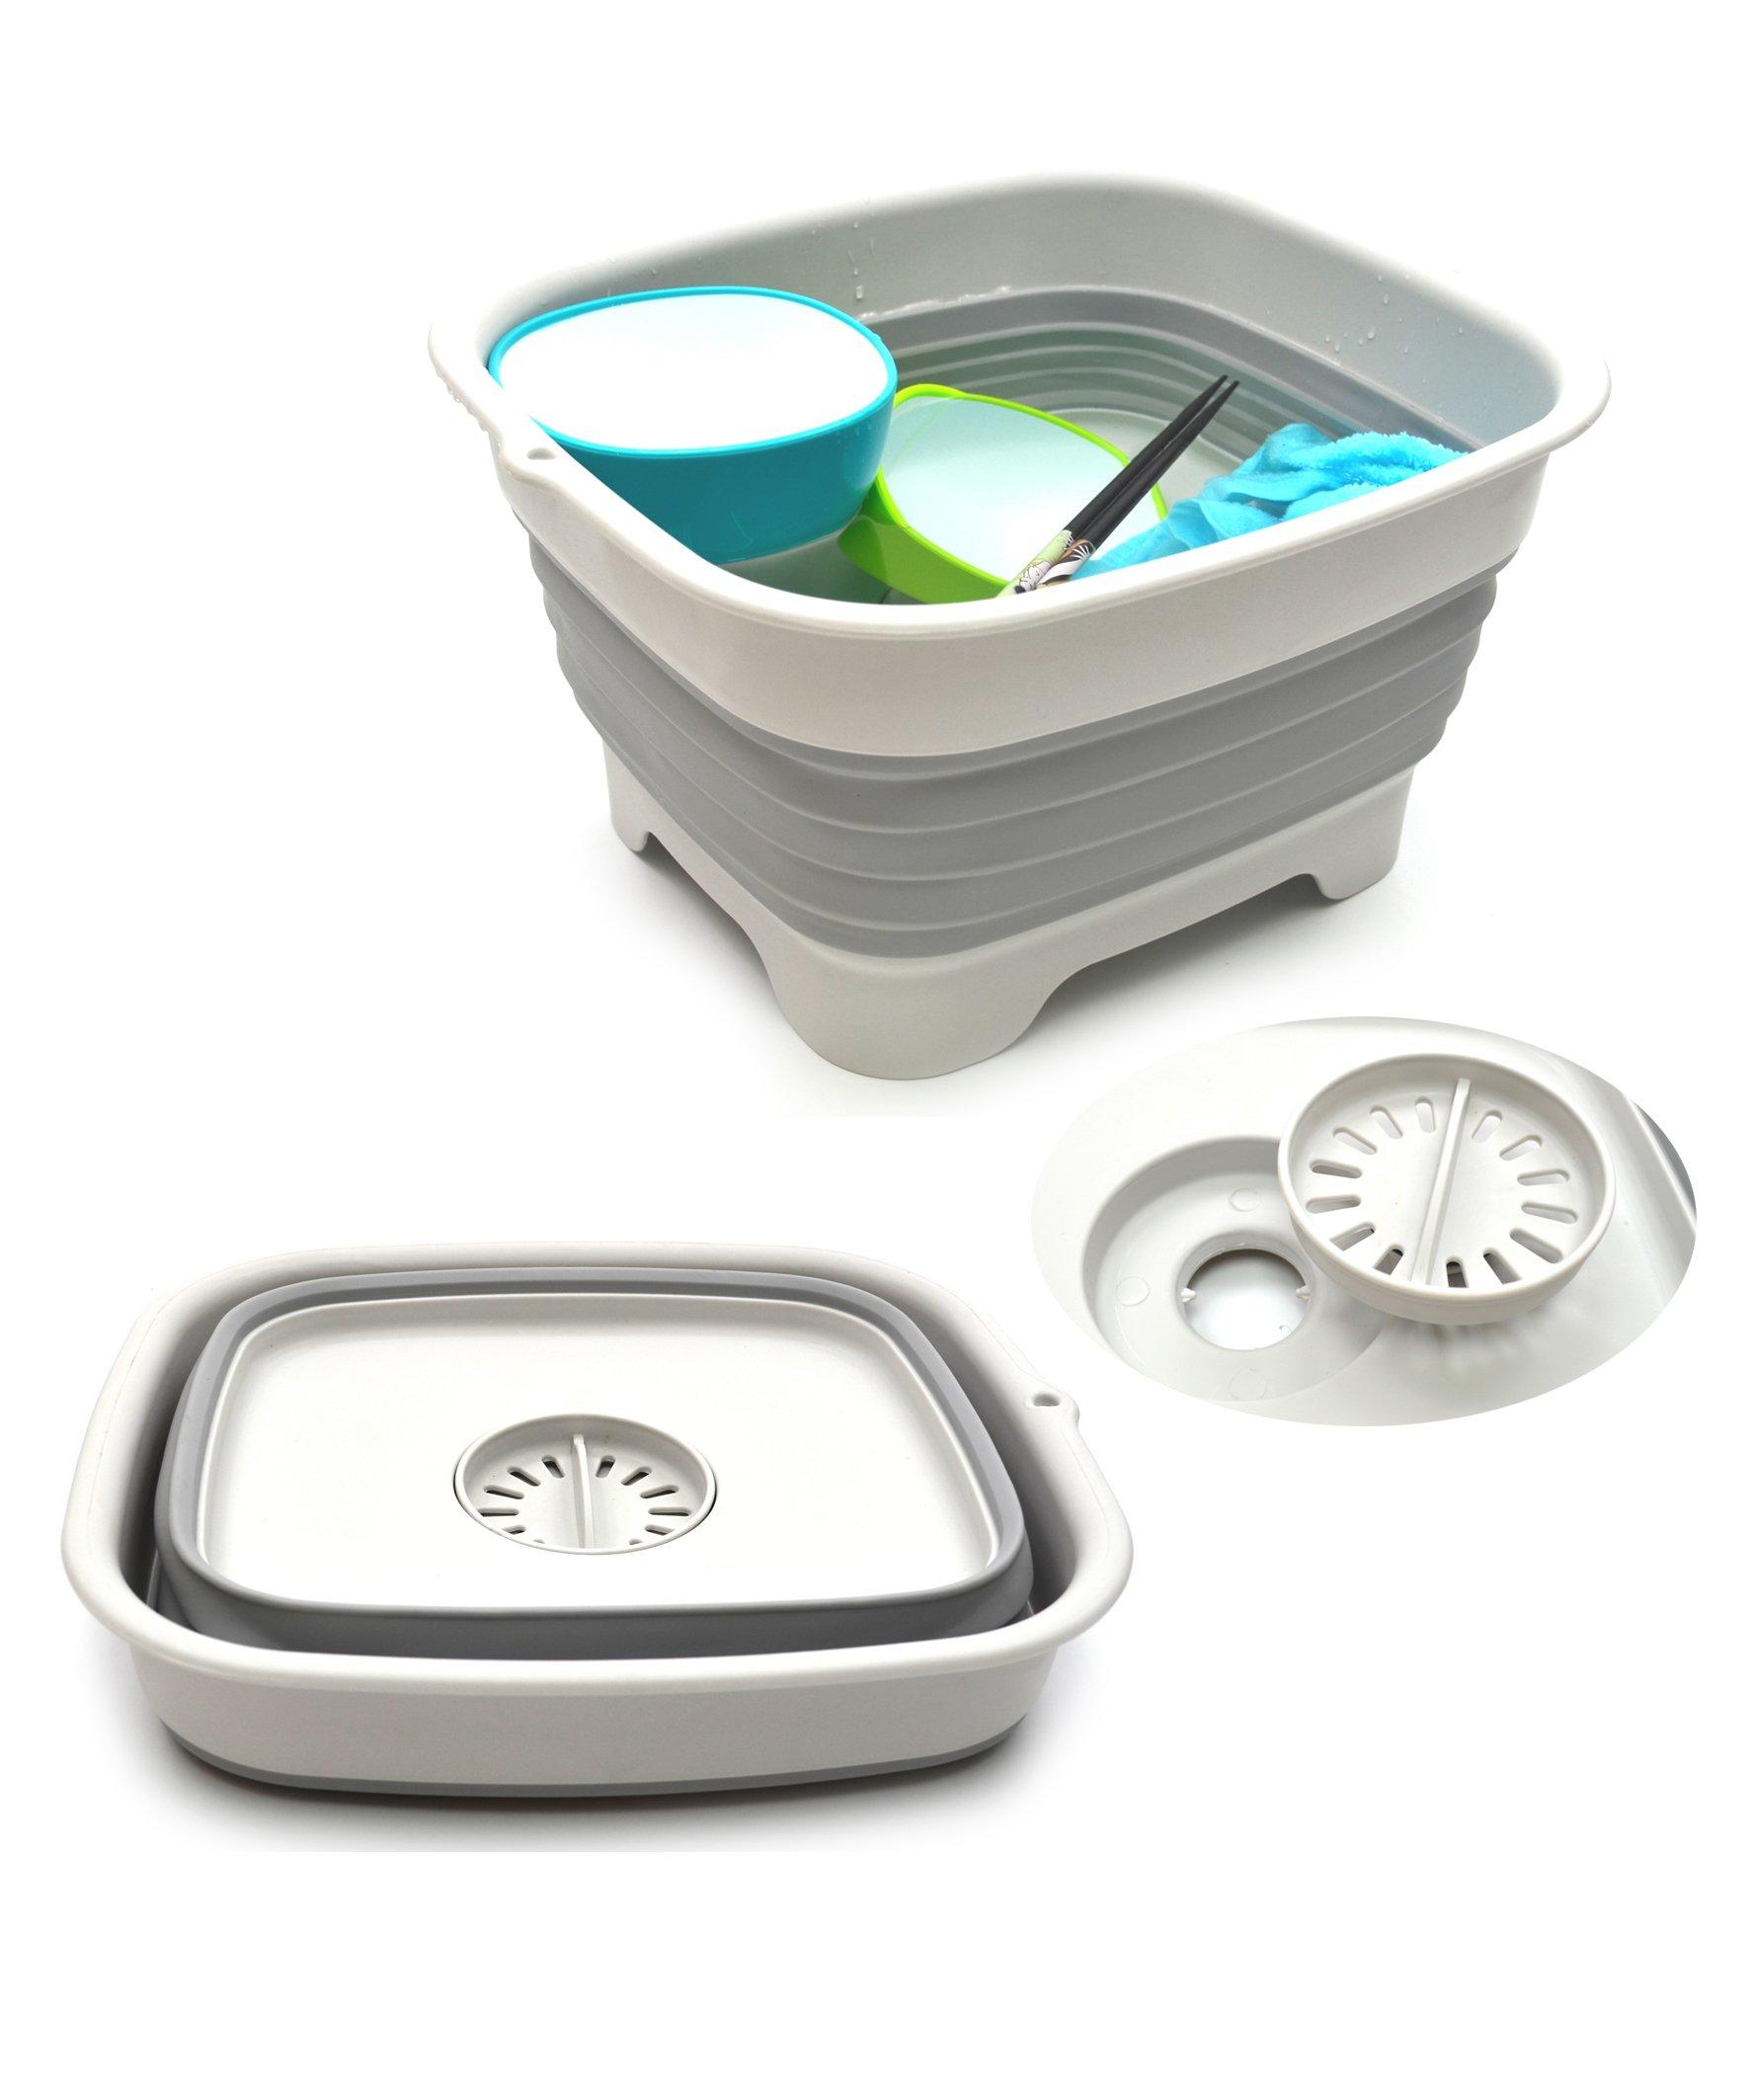 SAMMART 9.1L (2.4Gallon) Collapsible Dishpan with Draining Plug - Foldable Washing Basin - Portable Dish Washing Tub - Space Saving Kitchen Storage Tray (Grey)